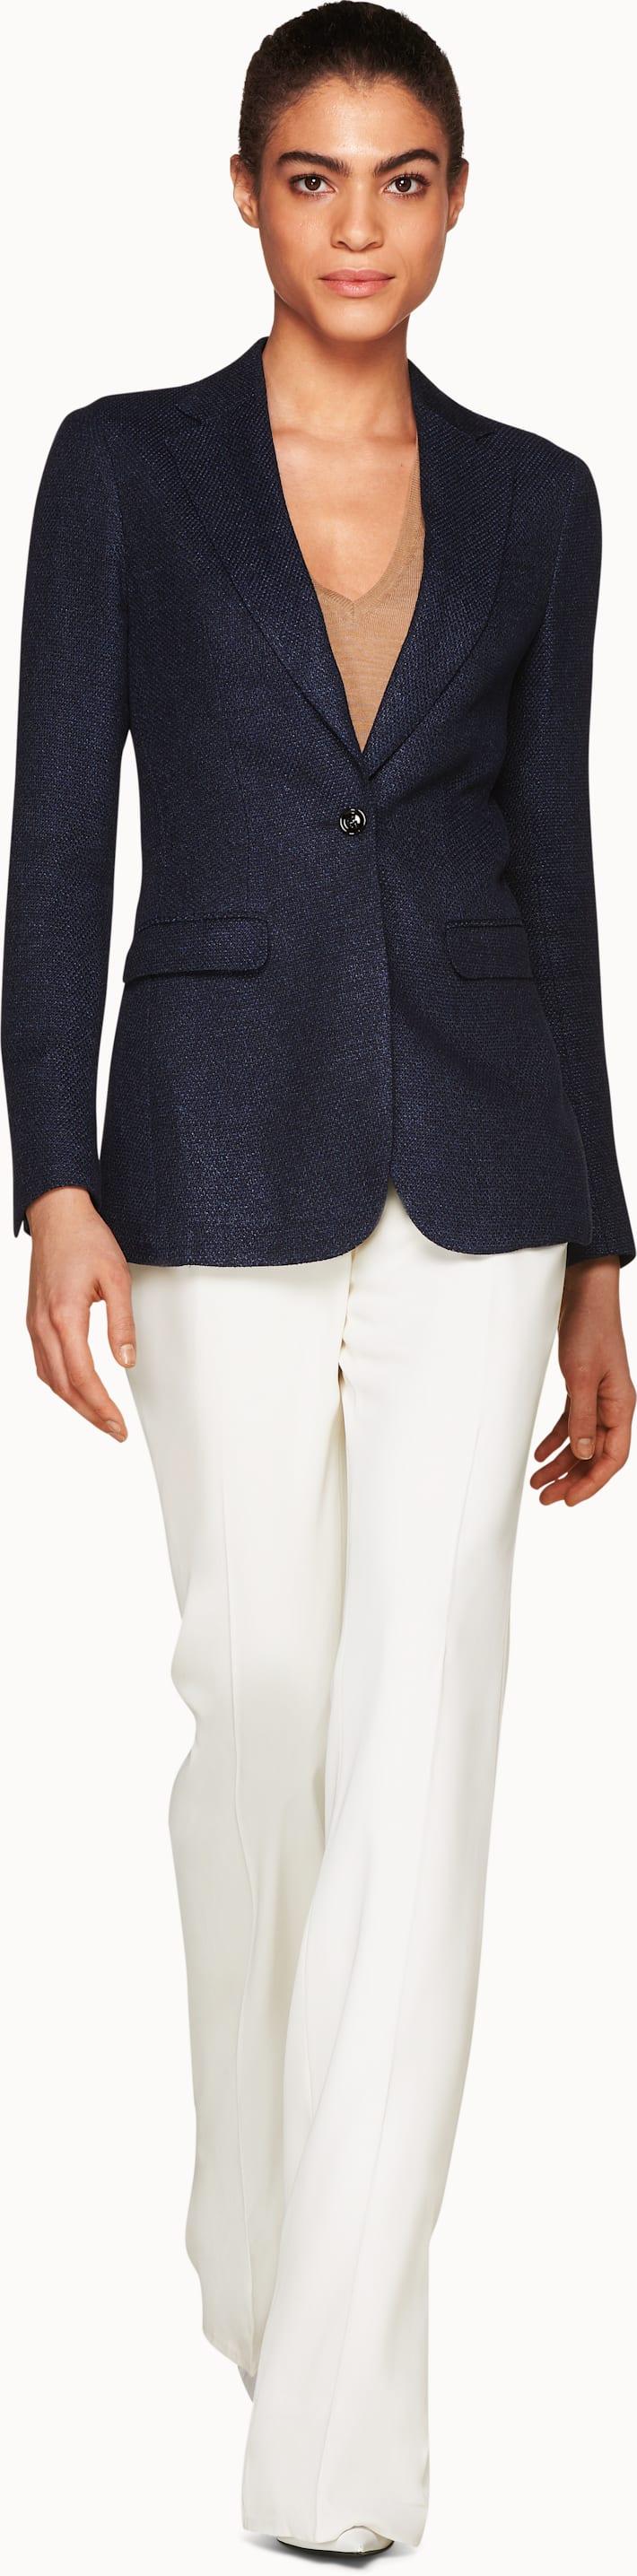 Cameron Blue  Jacket